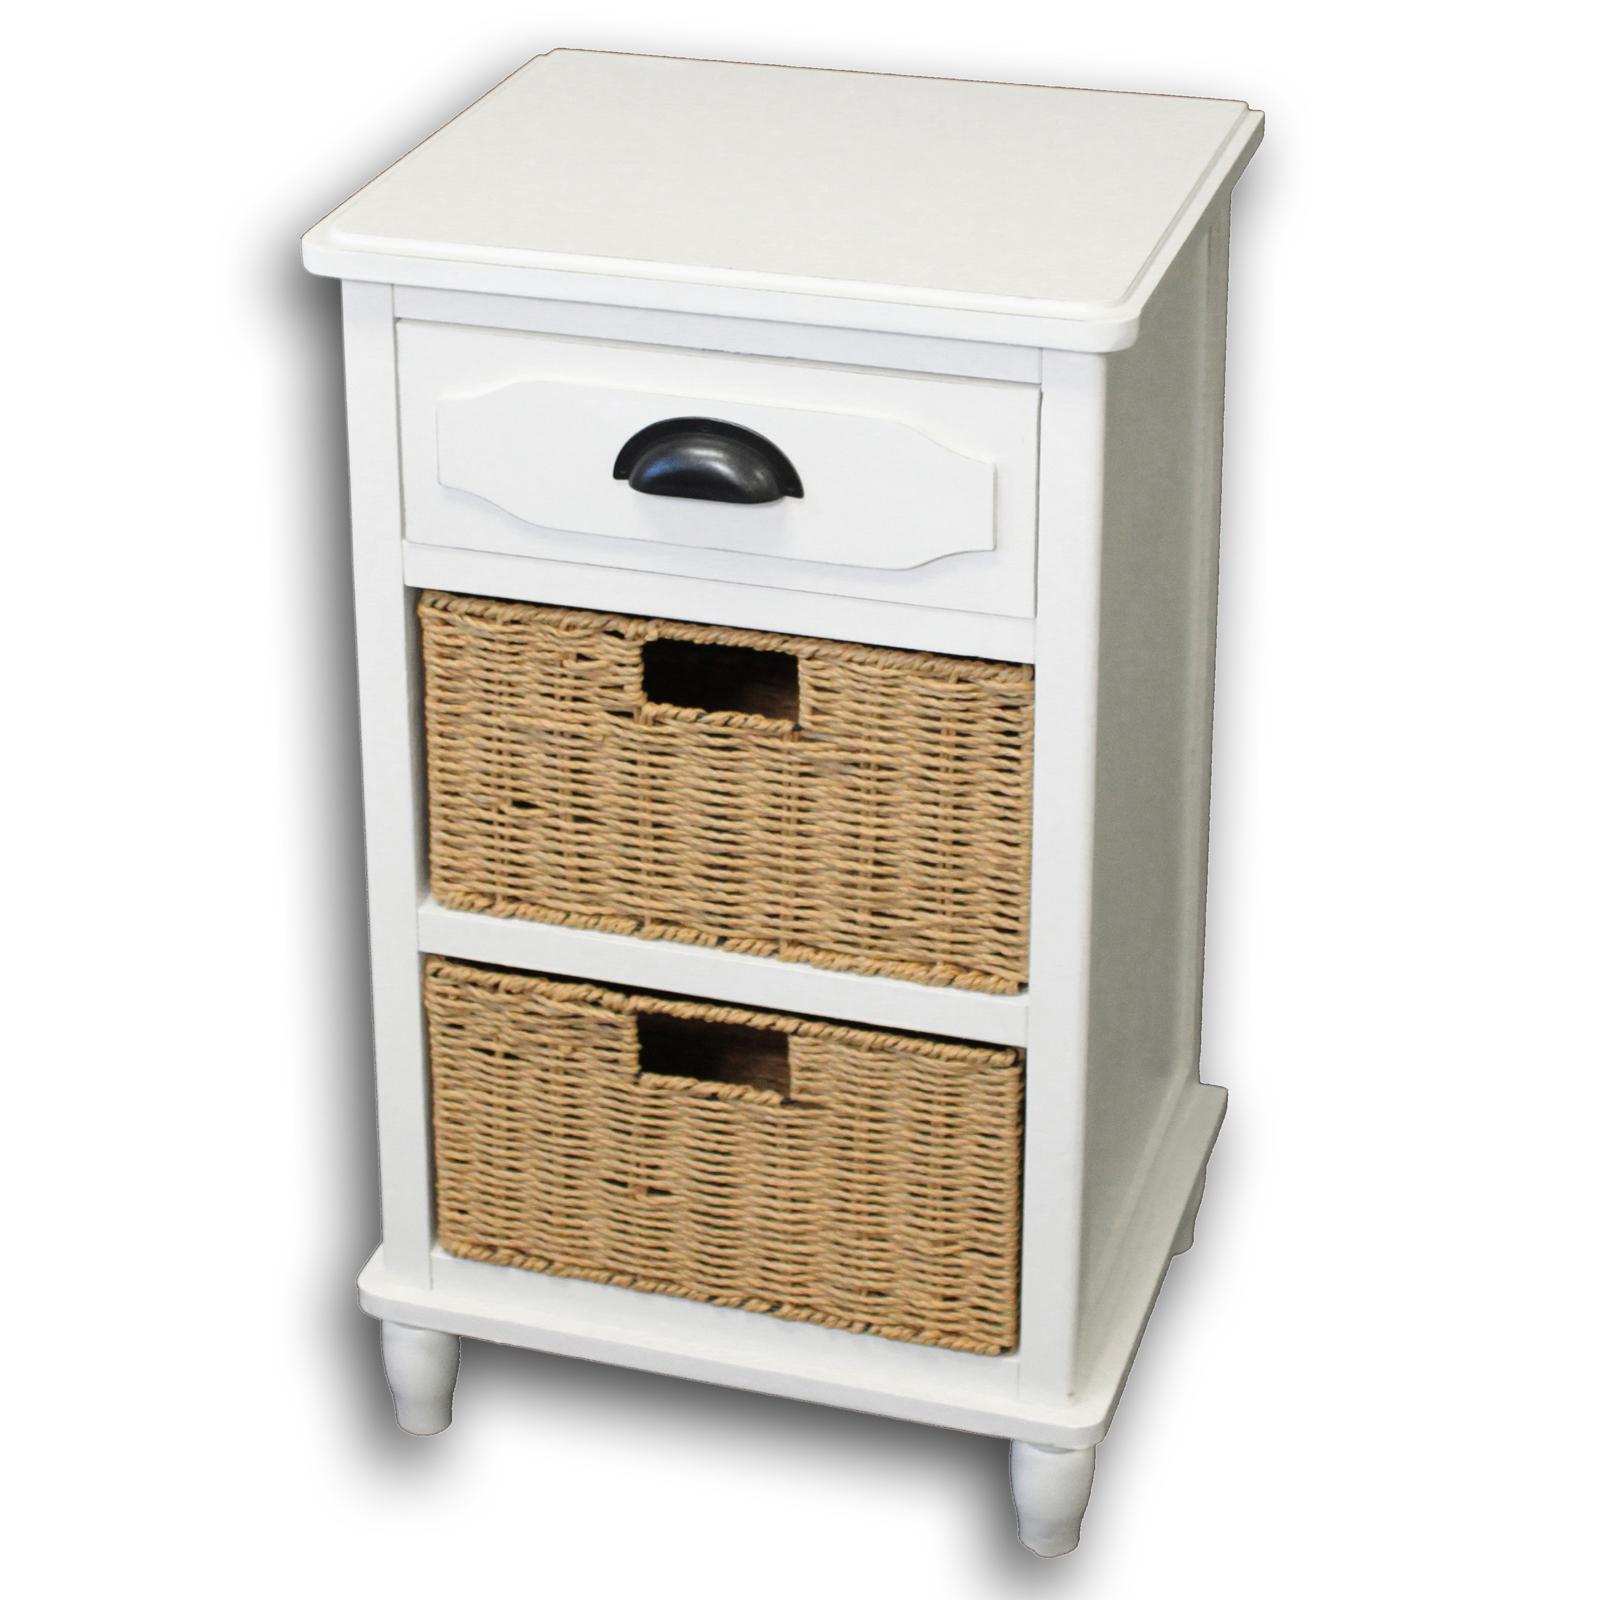 urban designs adriana 3 drawer night stand with wicker baskets white walmart com